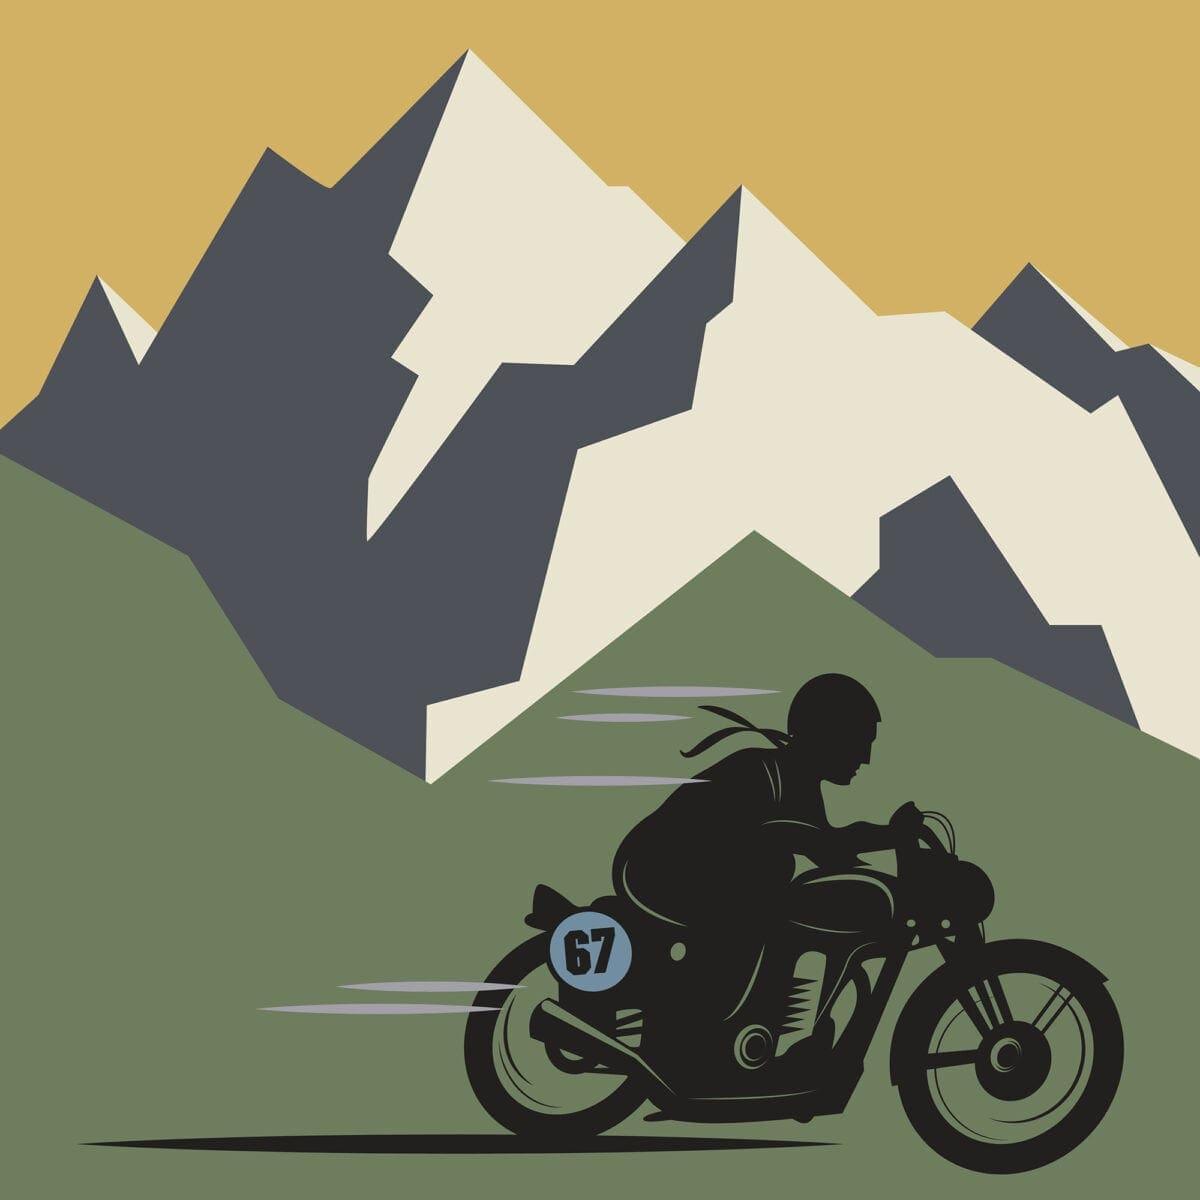 Classic Matchless British Motorcycle Motorbike Belt Buckle Belt Buckle 084